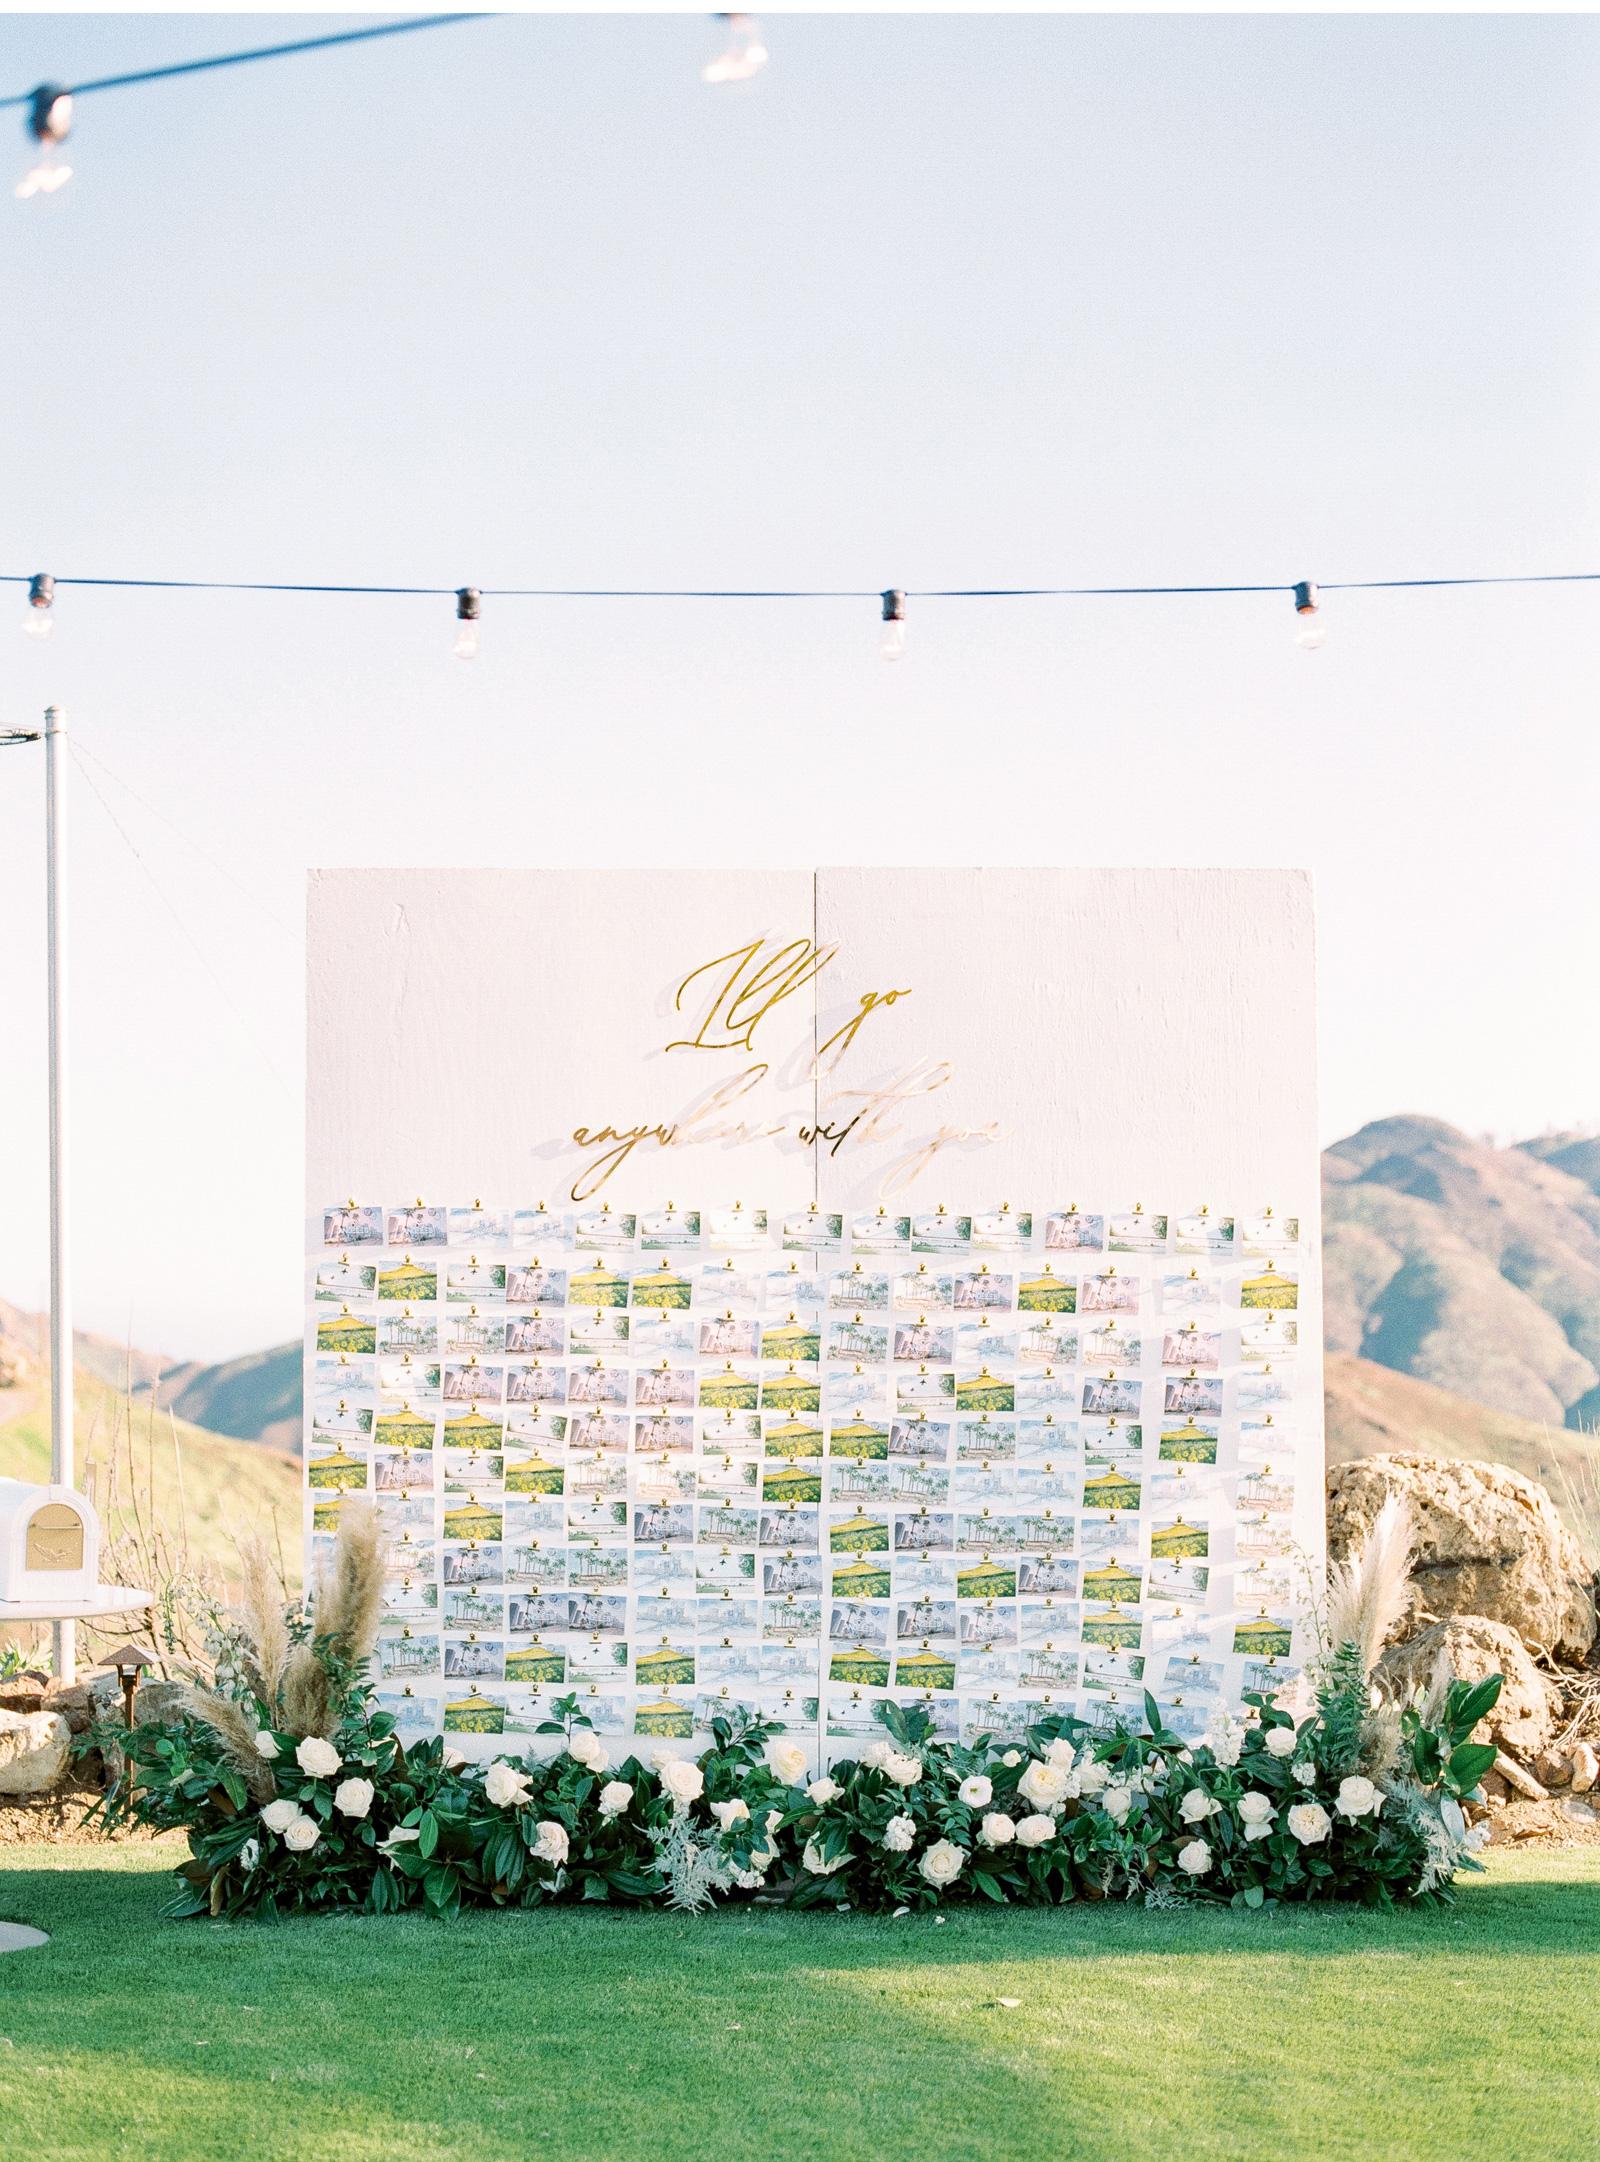 West-Coast-Weddings-Southern-California-Wedding-Photographer-Style-Me-Pretty-Fine-Art-Triunfo-Creek-Malibu-Natalie-Schutt-Photography_08.jpg